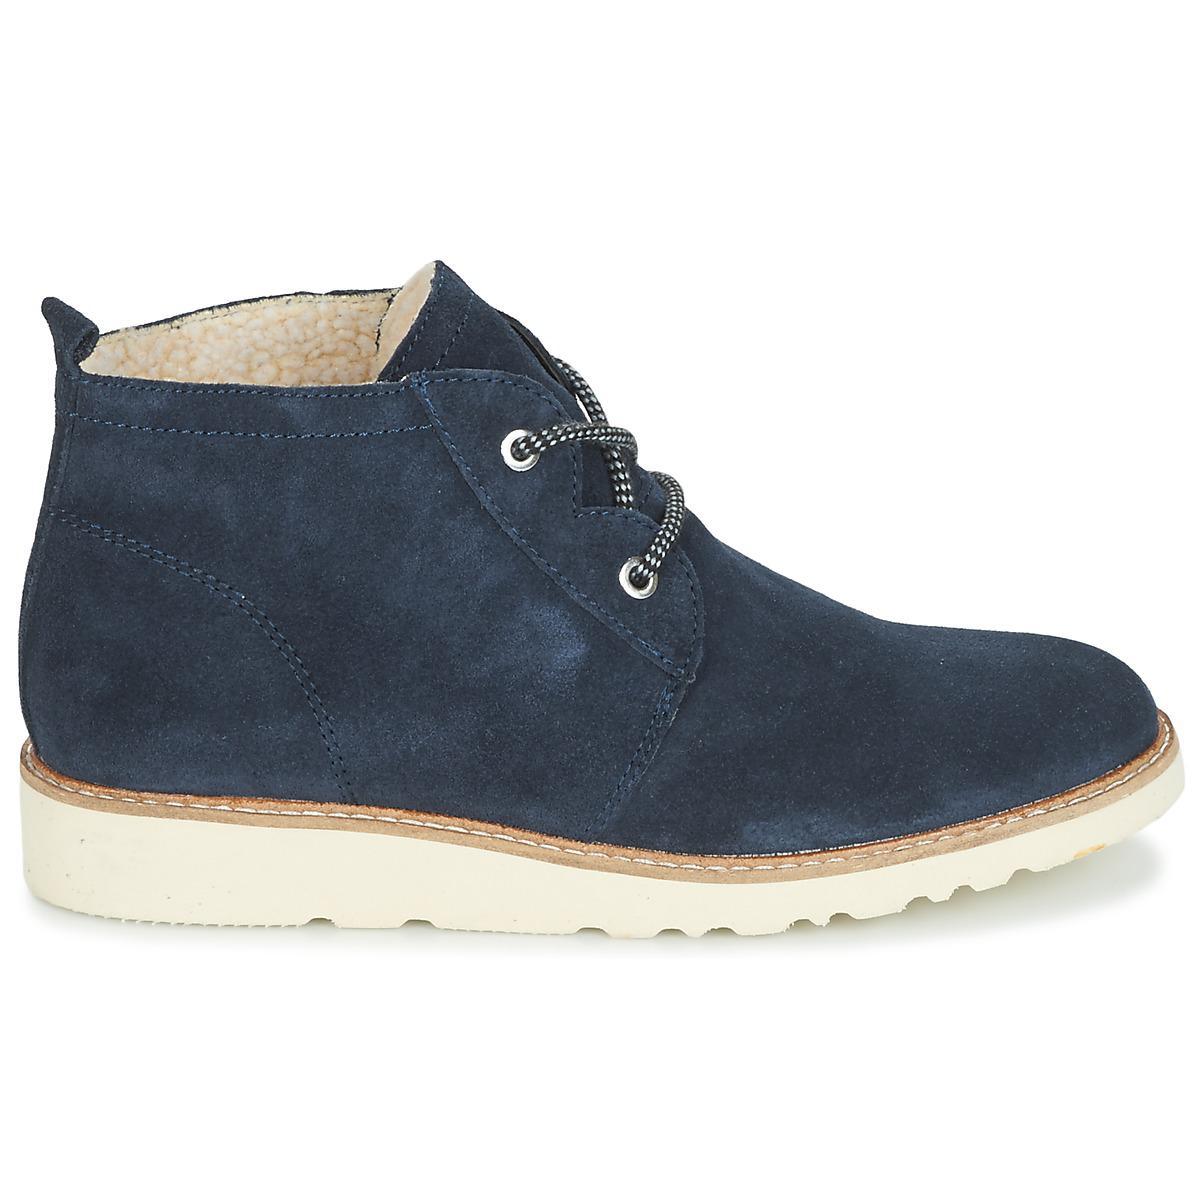 Women's Lyst Kajal Boots Esprit Blue Bootie Lu In Mid OHOPqtw8